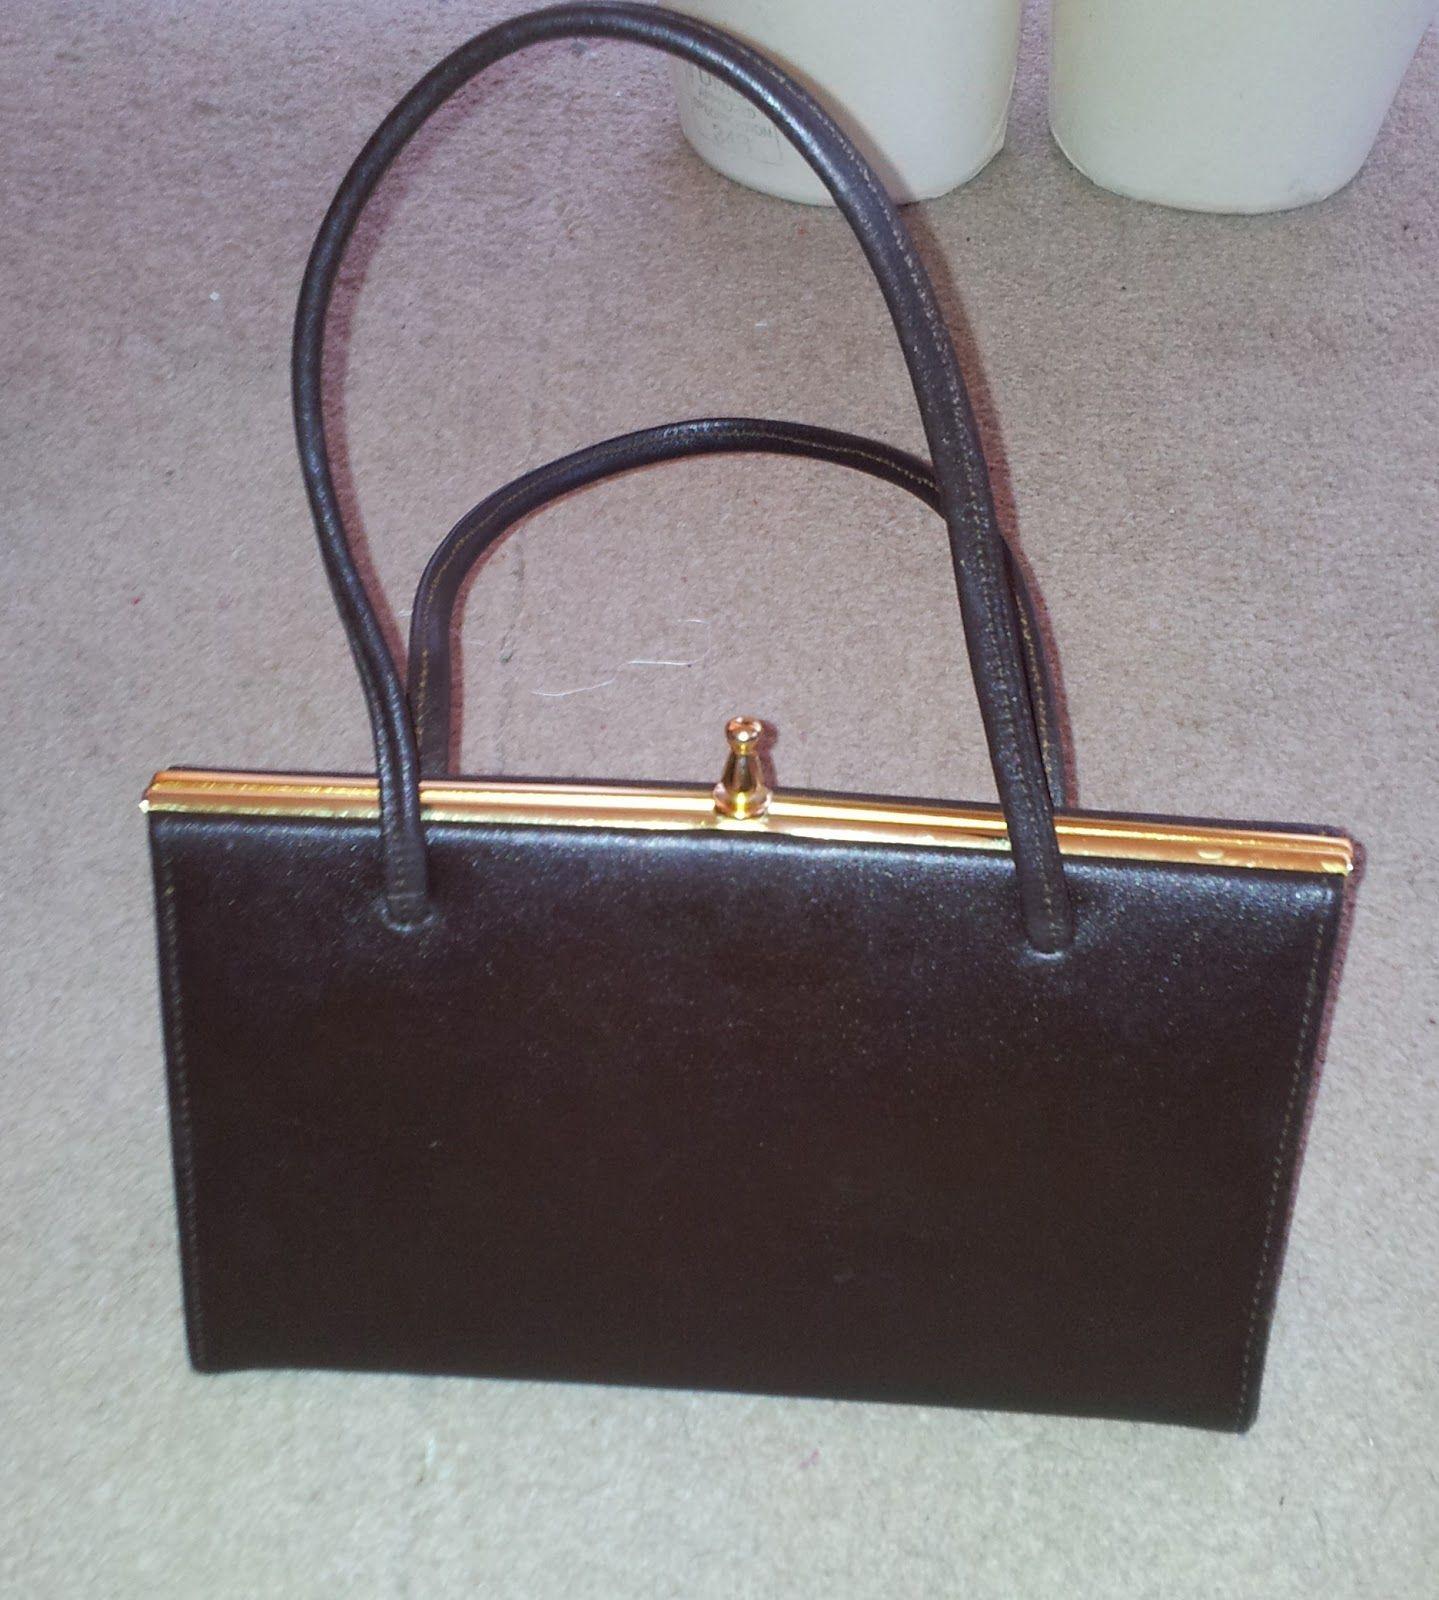 my mom kept wads of cash in a dozen purses hidden high up on the top shelf of her closet